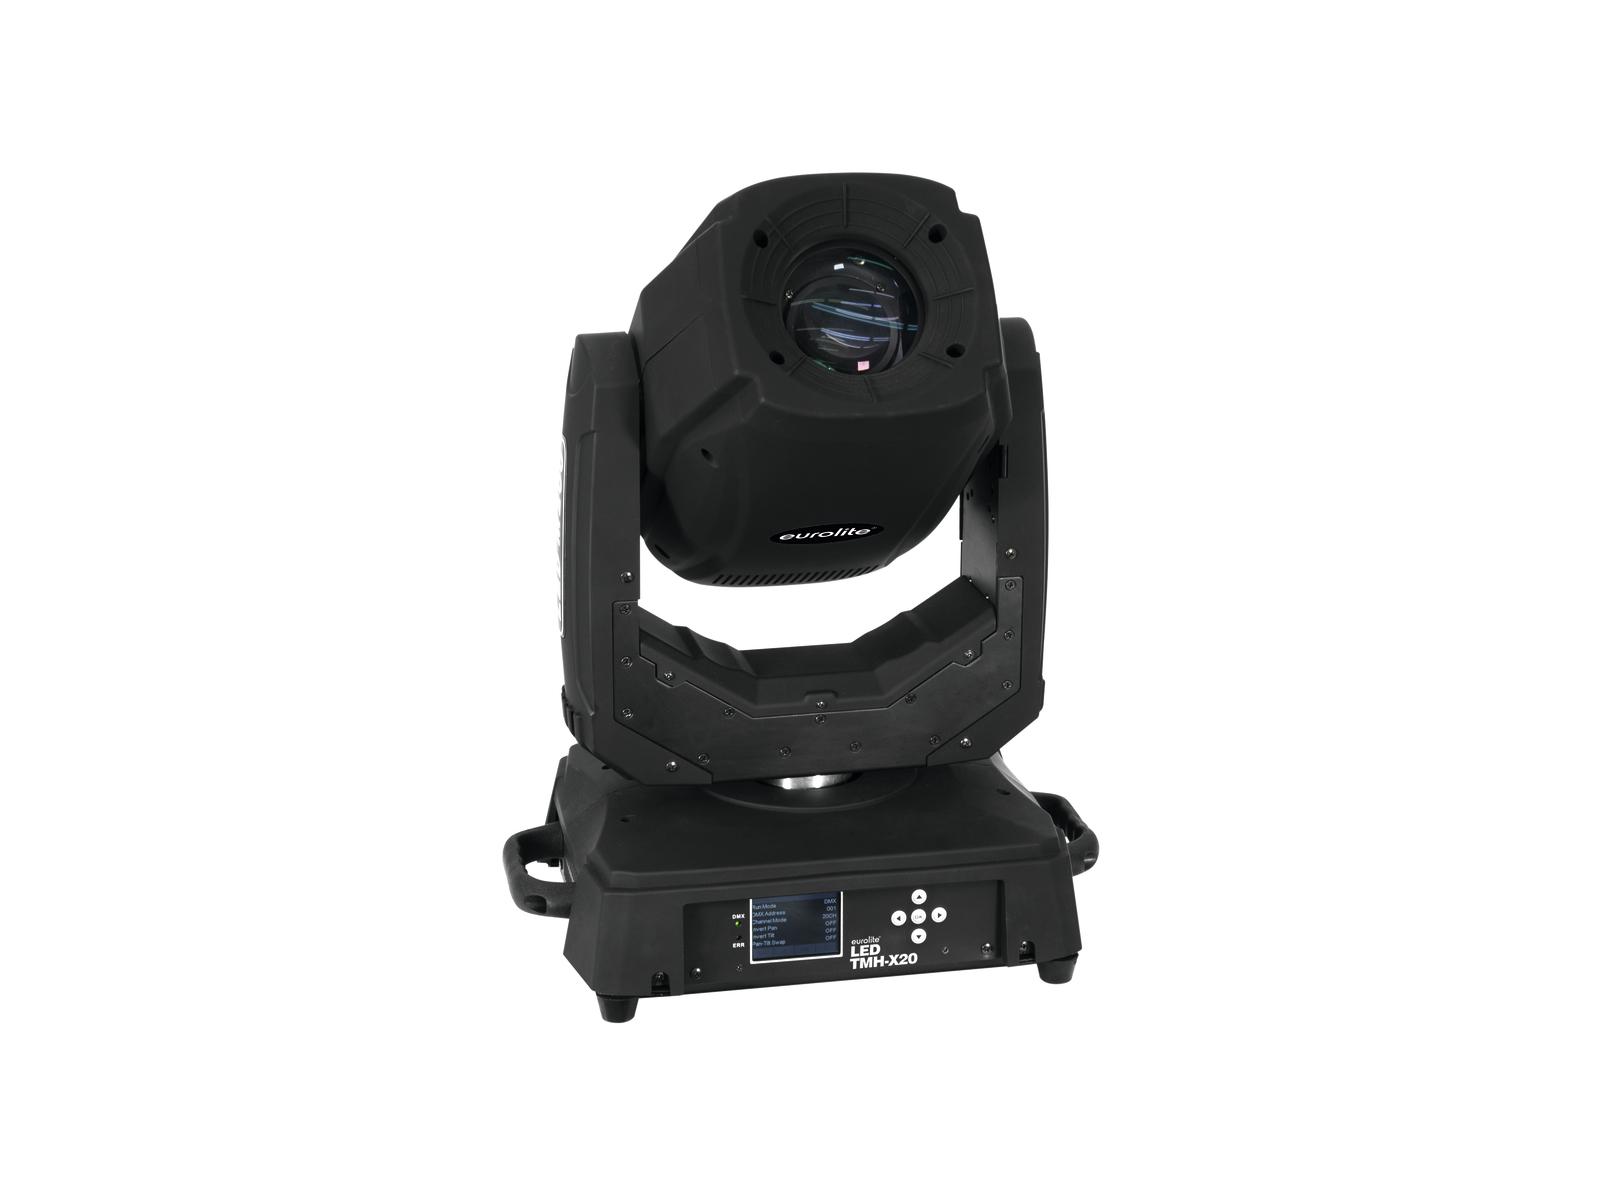 Eurolite LED TMH-X20 otočná hlavice Spot, 1x200W COB LED, DMX